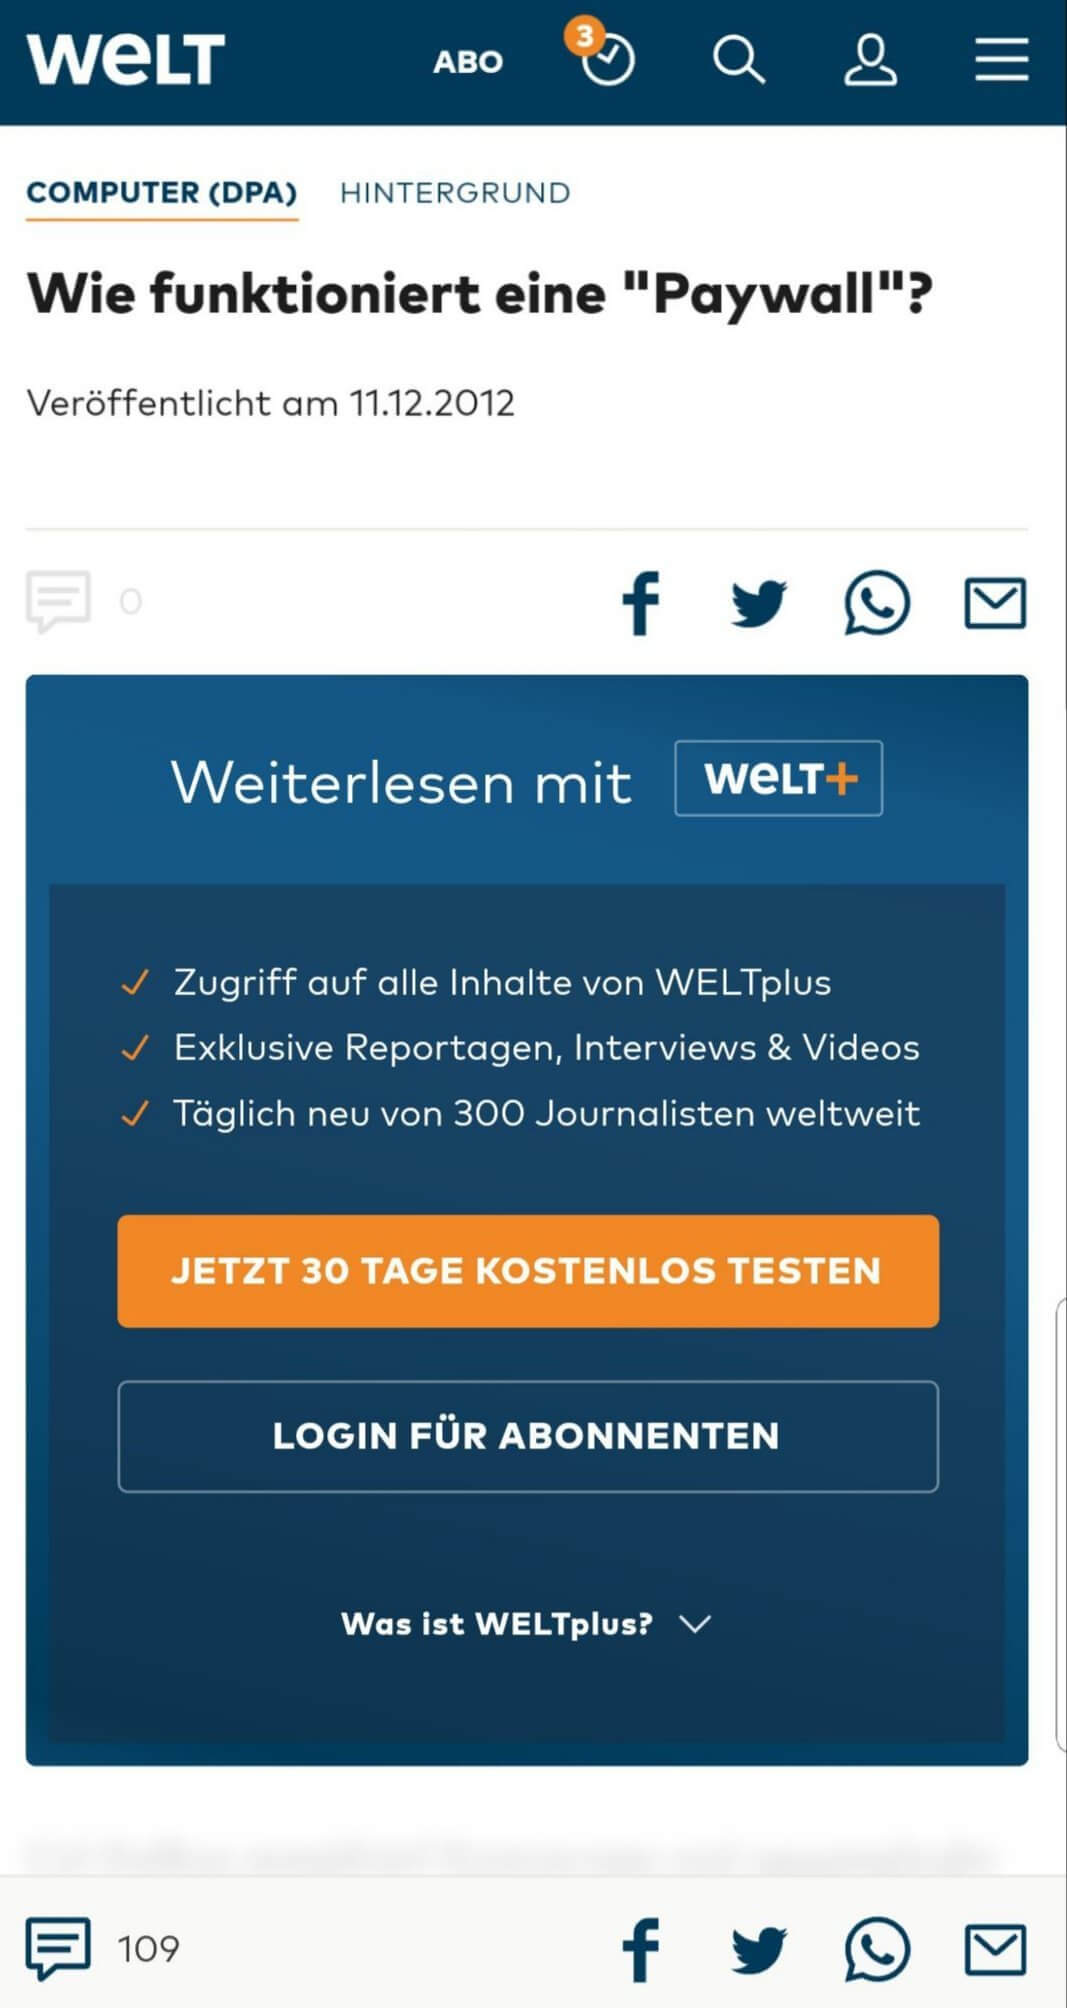 Bilderparade DXI LangweileDich.net_Bilderparade_DXI_75